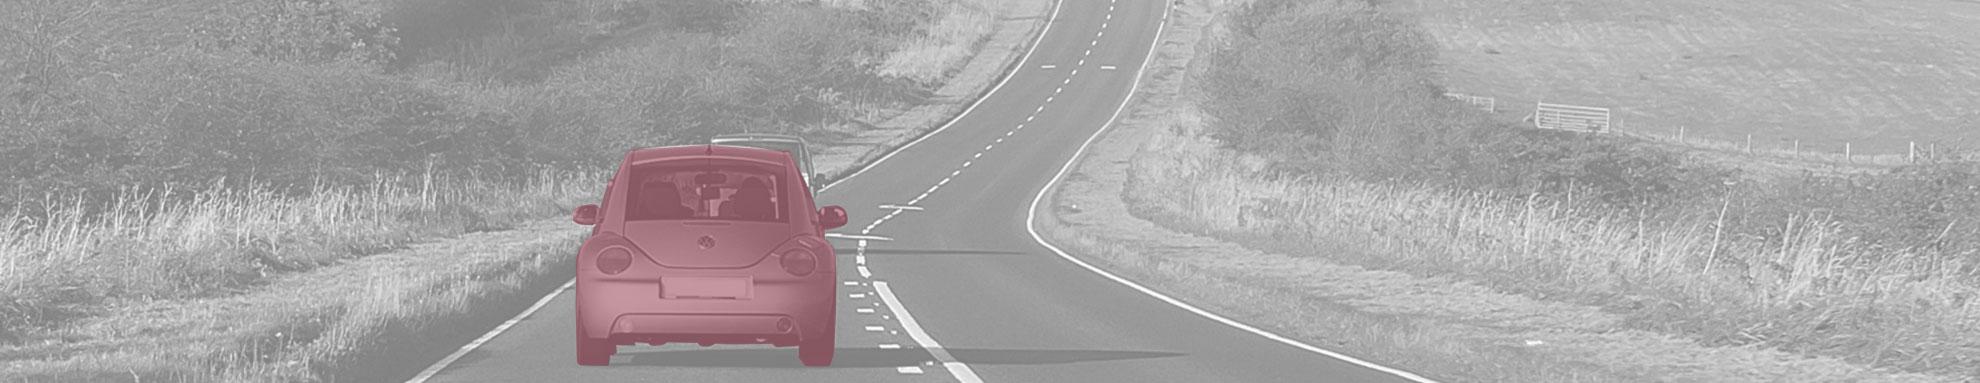 Preventass b.v. Veenendaal autoverzekering